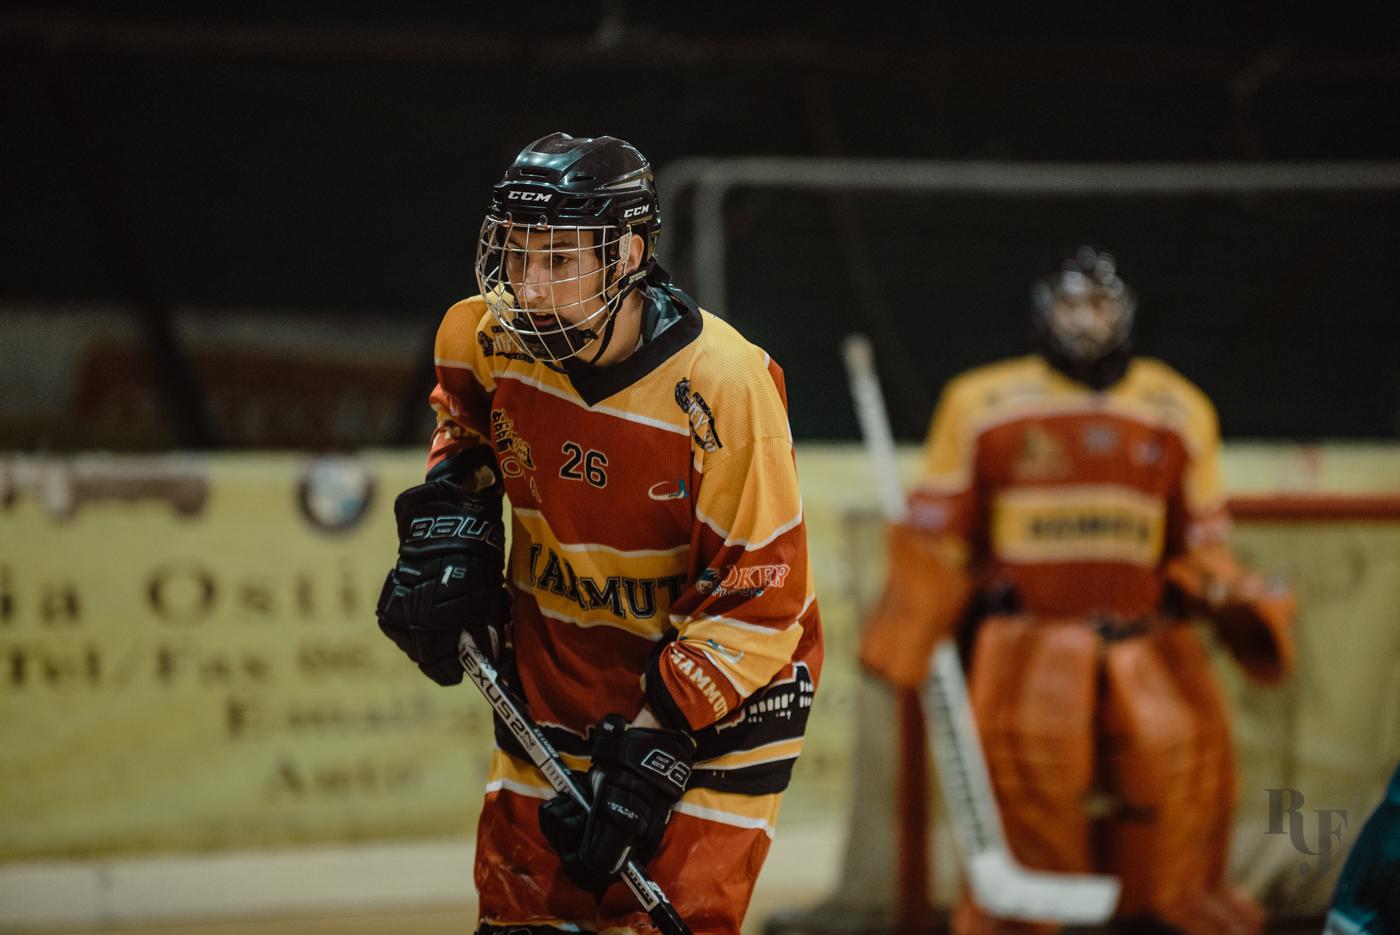 Mammuth hockey roma, Libertas Forli, Rita Foldi photography, inline hockey, hockey inline roma, rome hockey, hockey in rome, campionato B, FISR hockey inline , sports photography